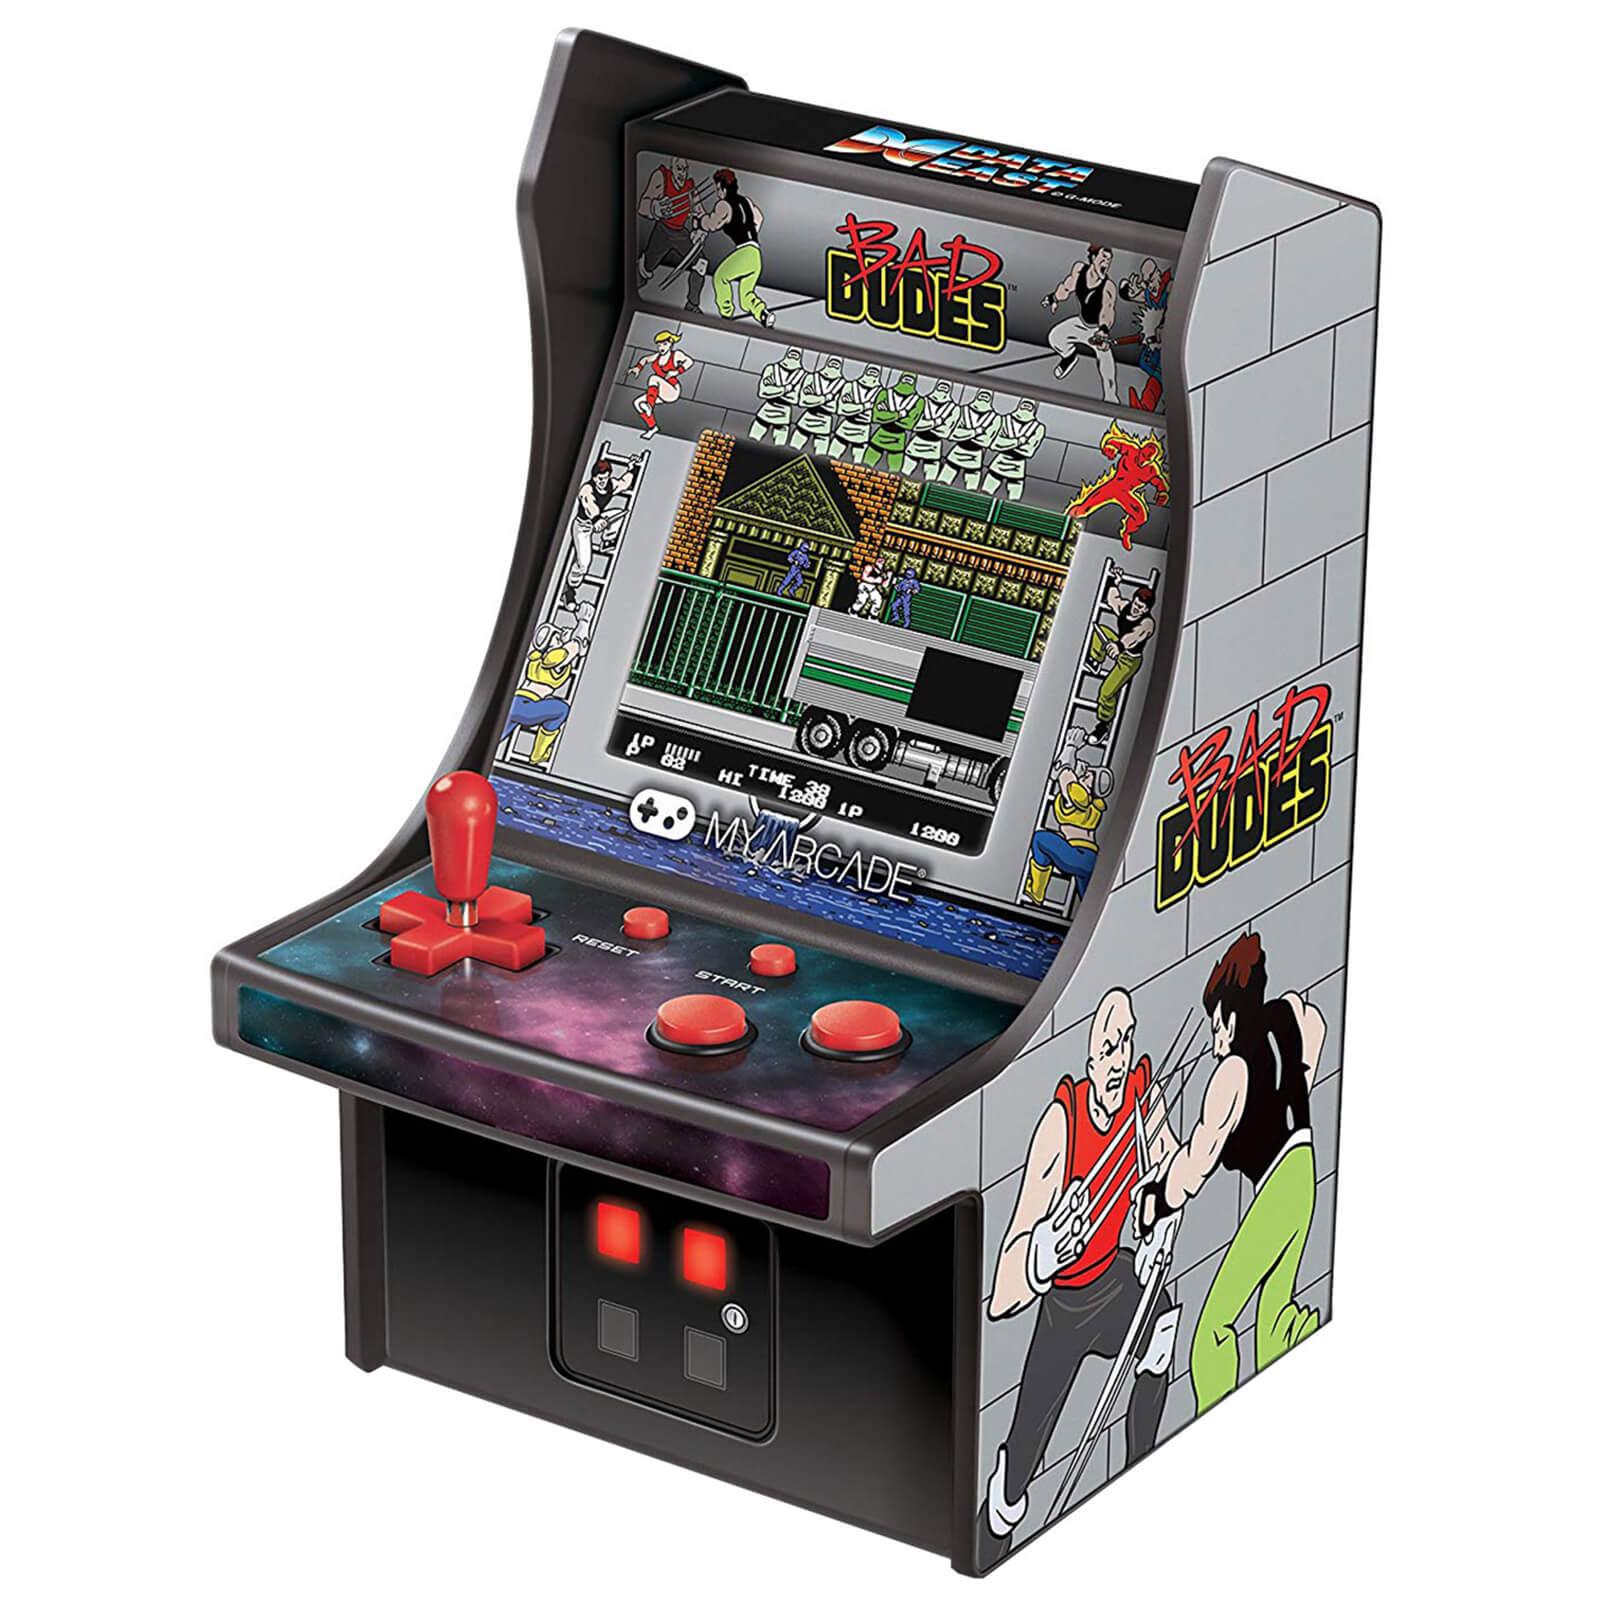 Image of DreamGear Retro Arcade 6 Inch Bad Dudes Micro Player